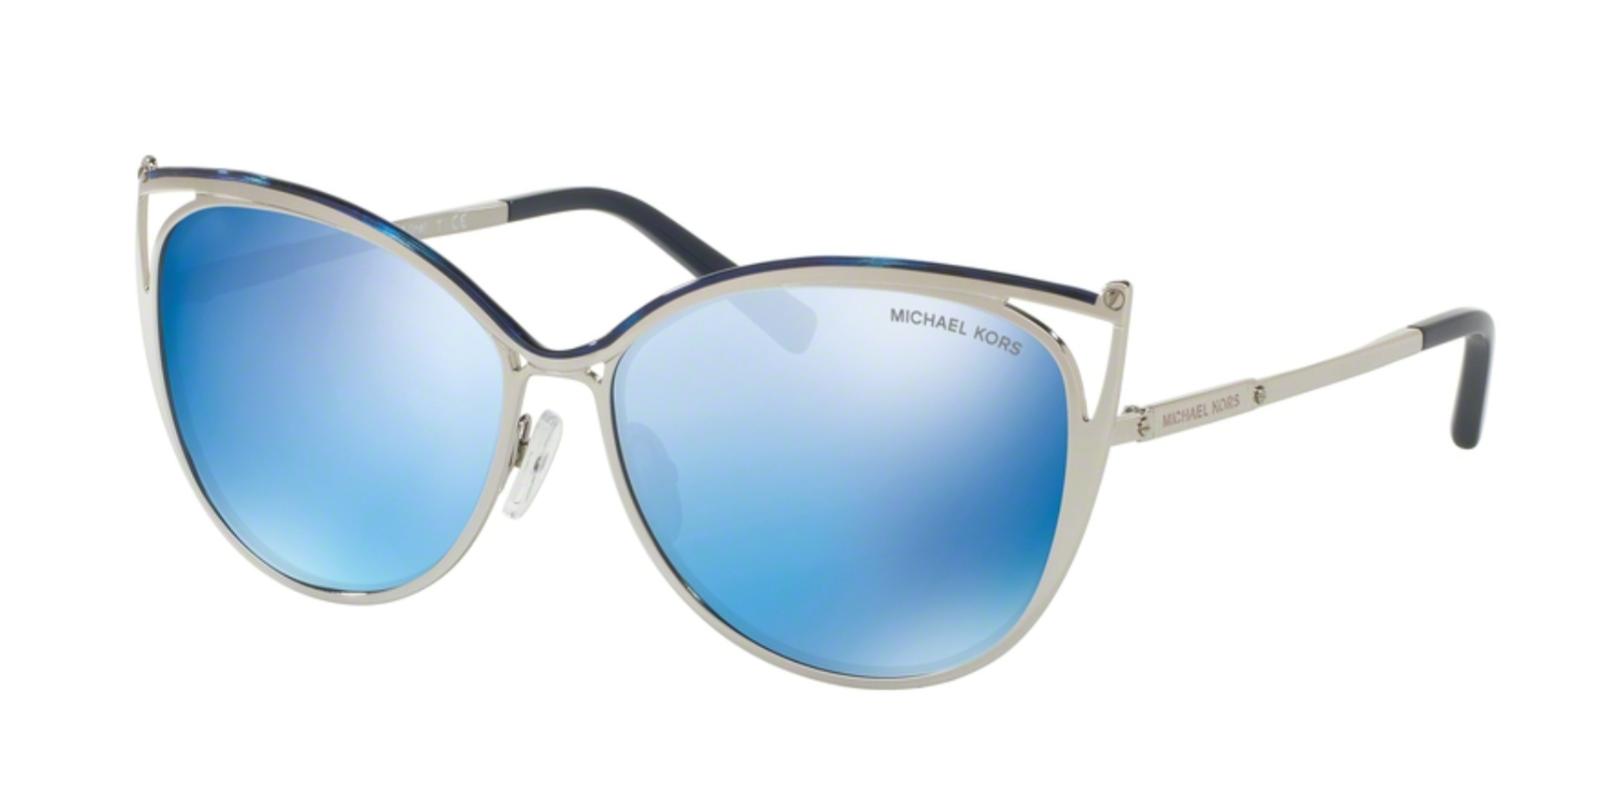 New MICHAEL KORS Sunglasses INA MK 1020 116755 Navy Silver Tone w/ Navy Mirror